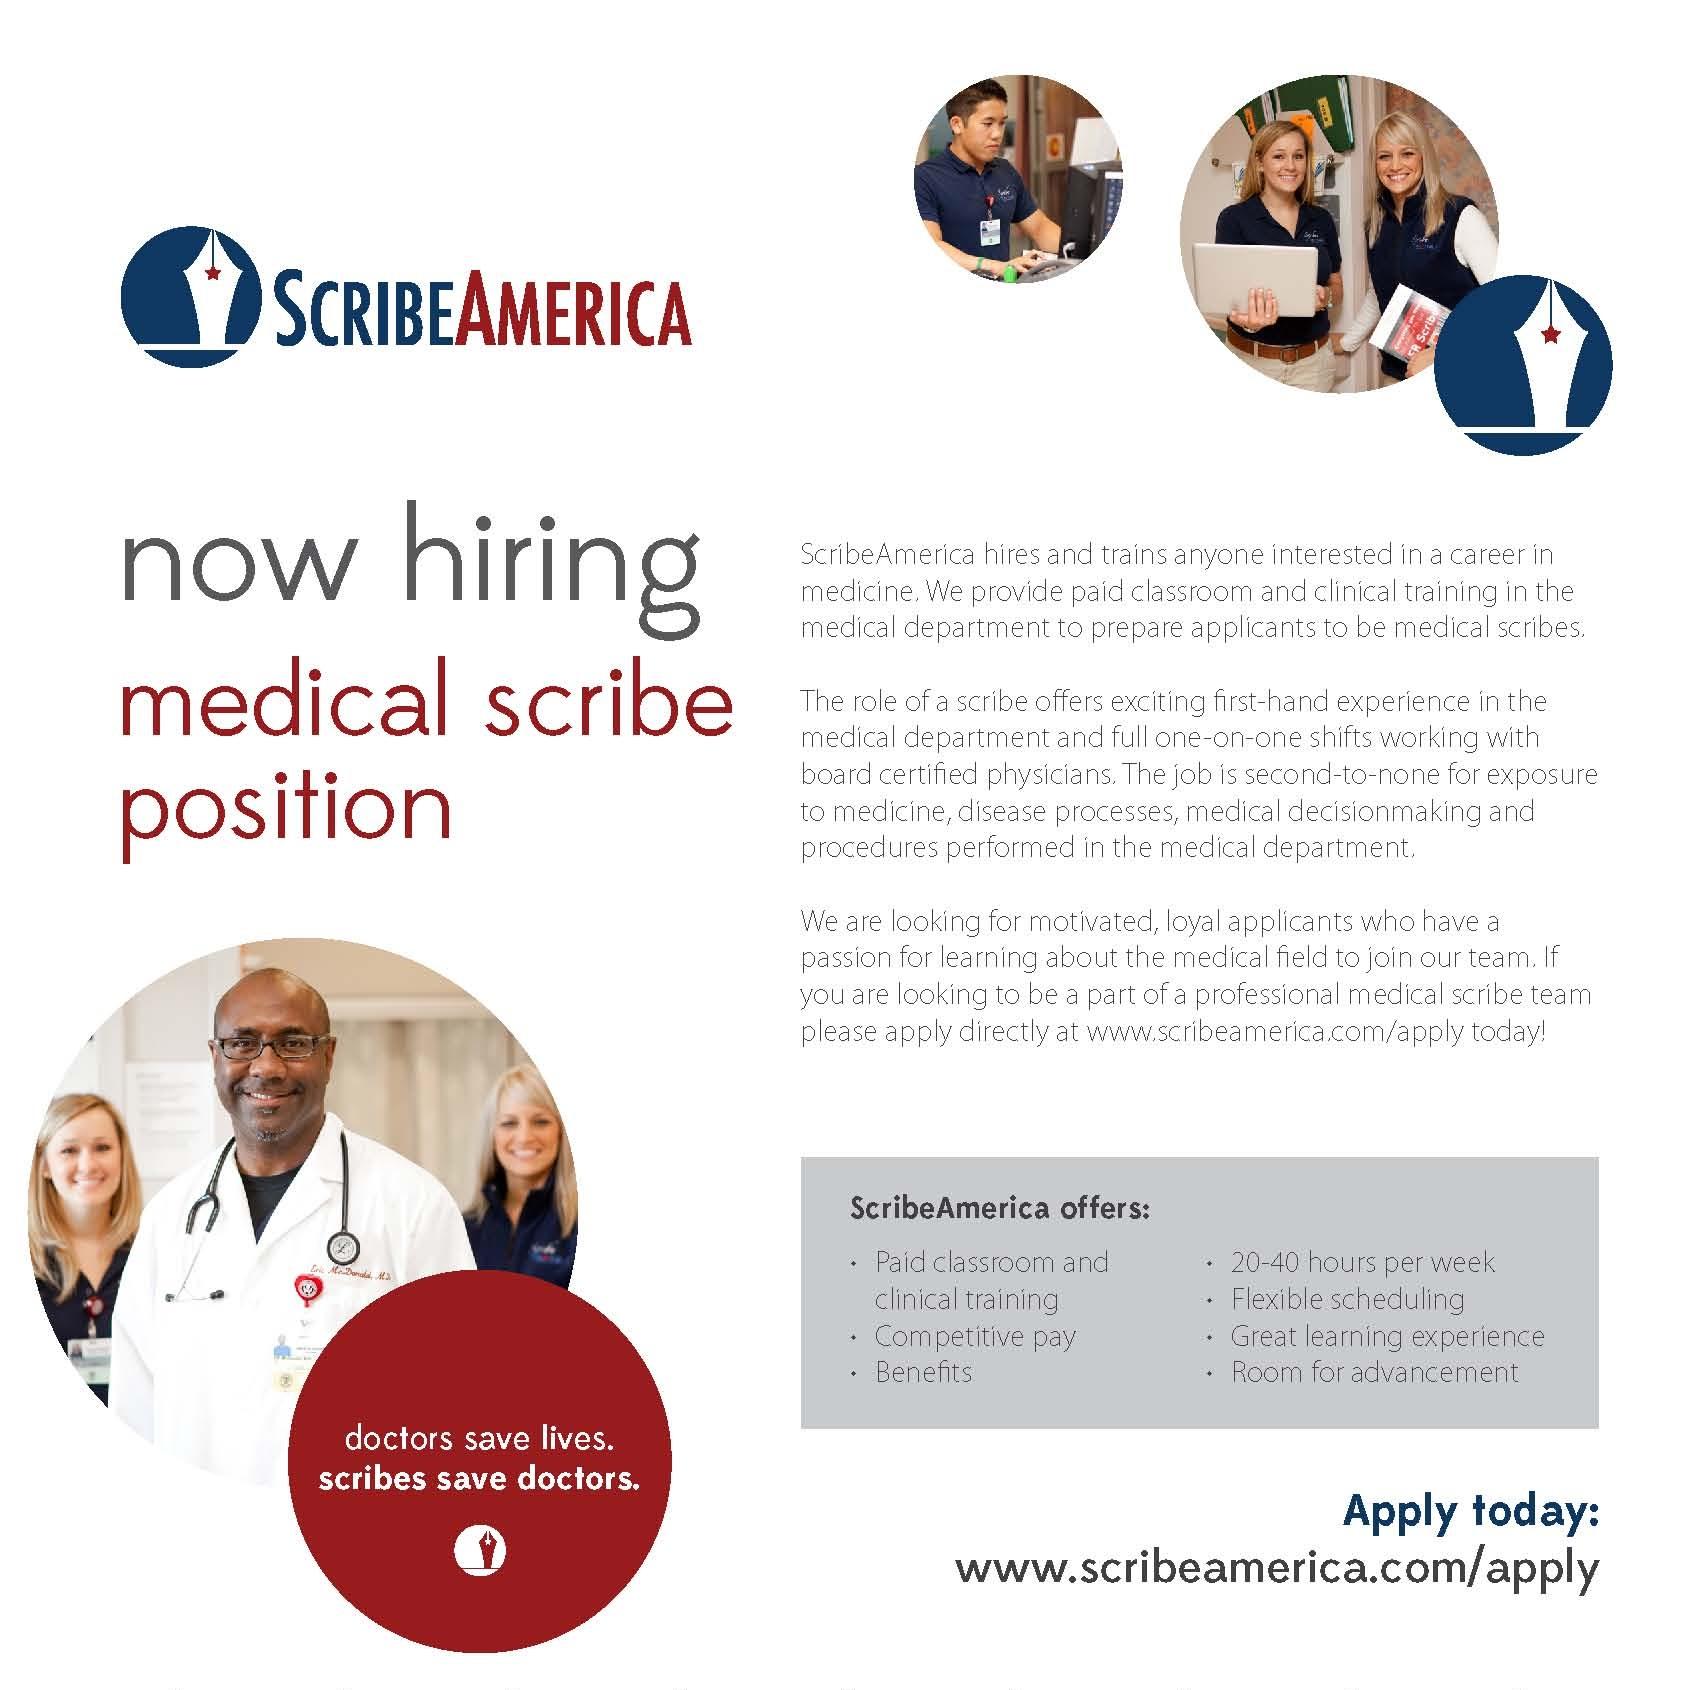 ScribeAmerica Hiring Medical Scribe